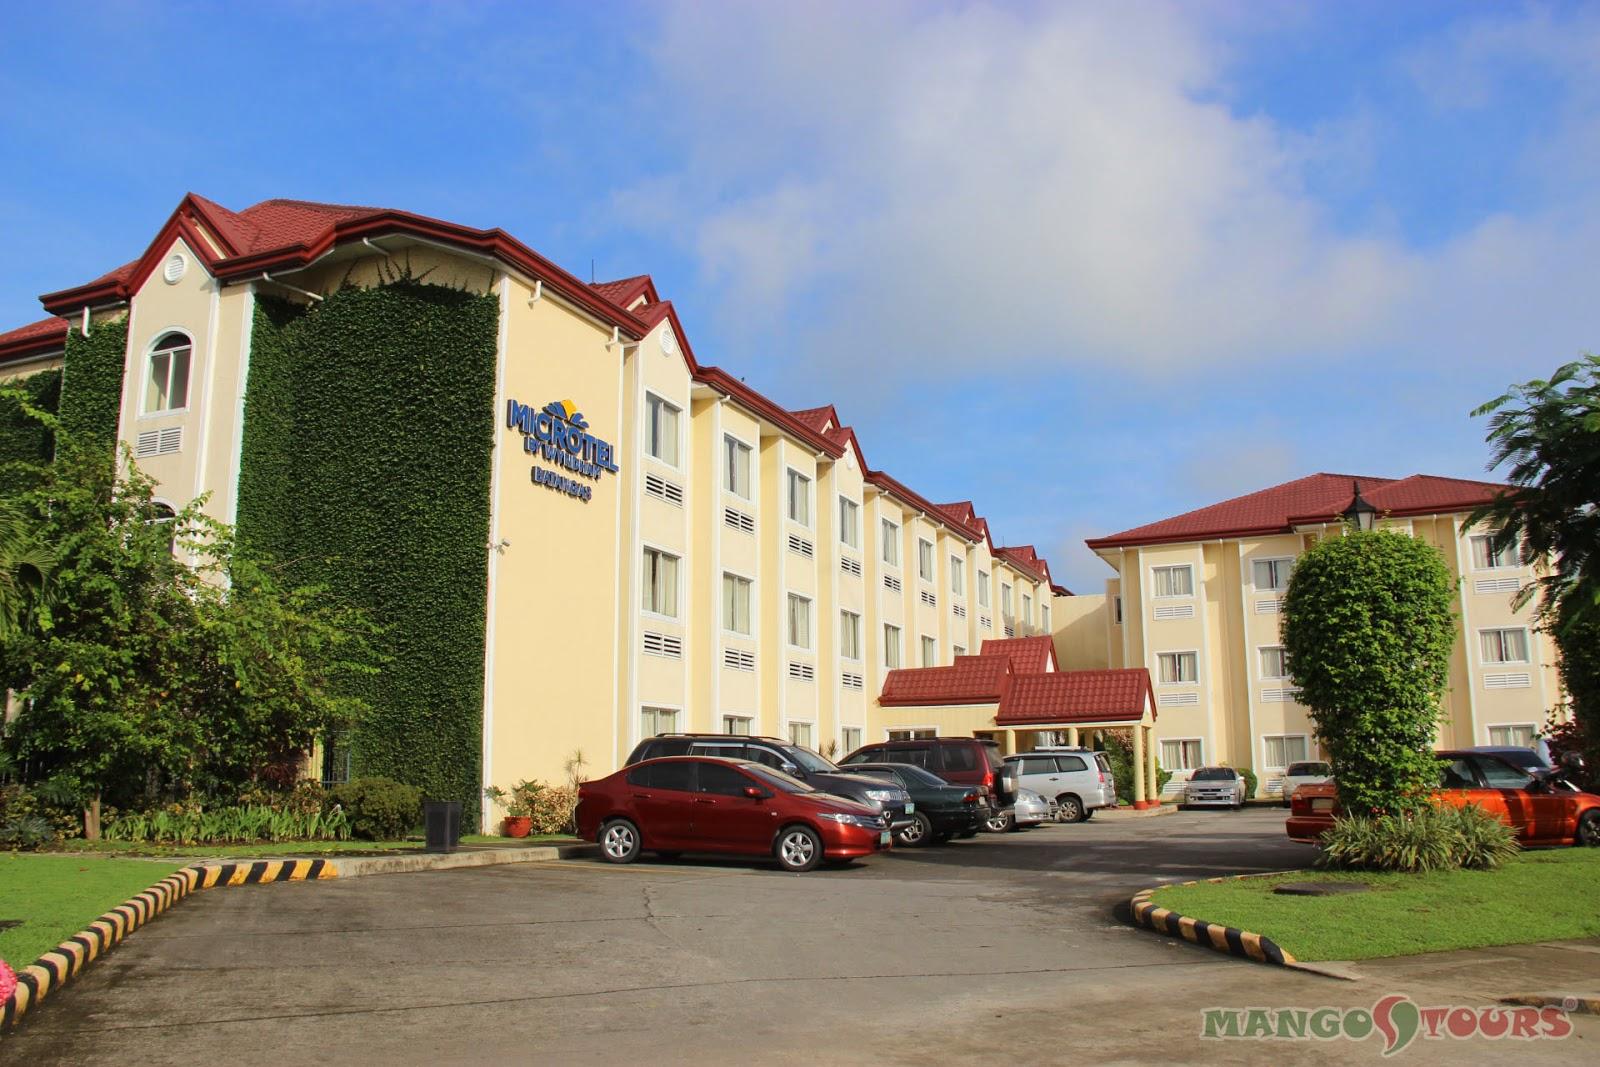 Mango Tours Microtel by Wyndham Sto. Tomas Batangas facade